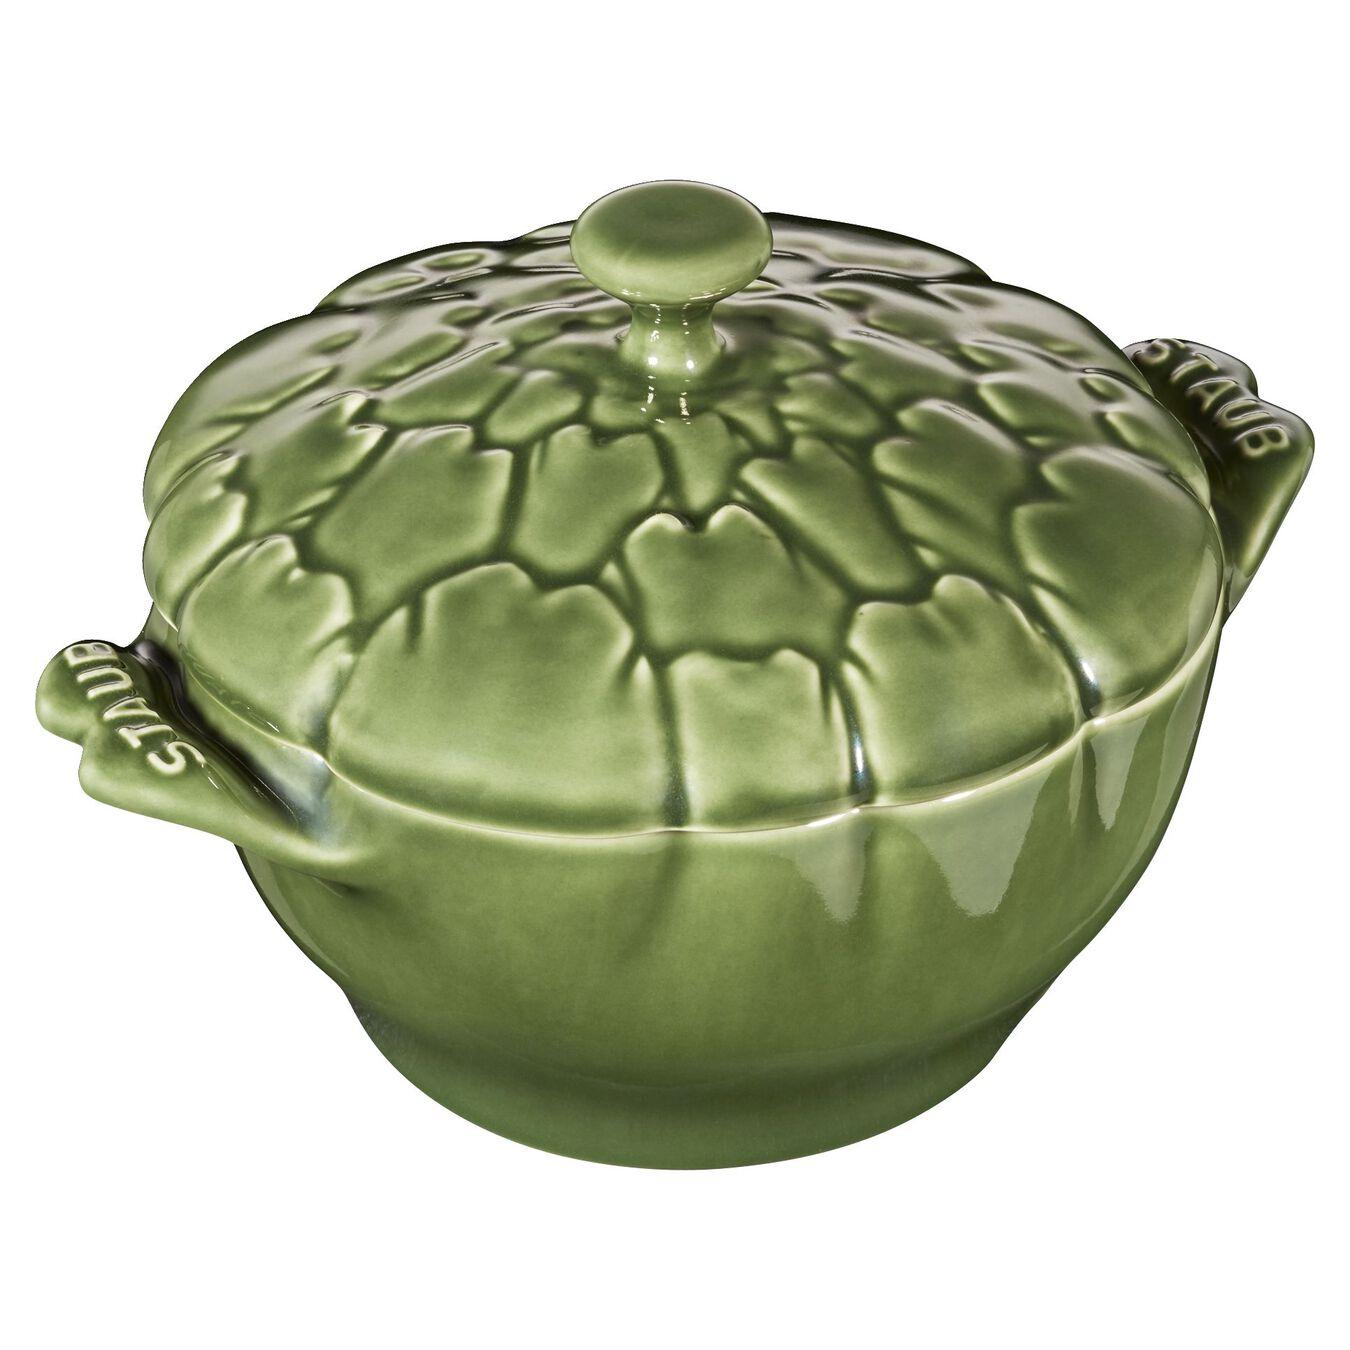 Cocotte 13 cm, Artischocke, Basilikum-Grün, Keramik,,large 9